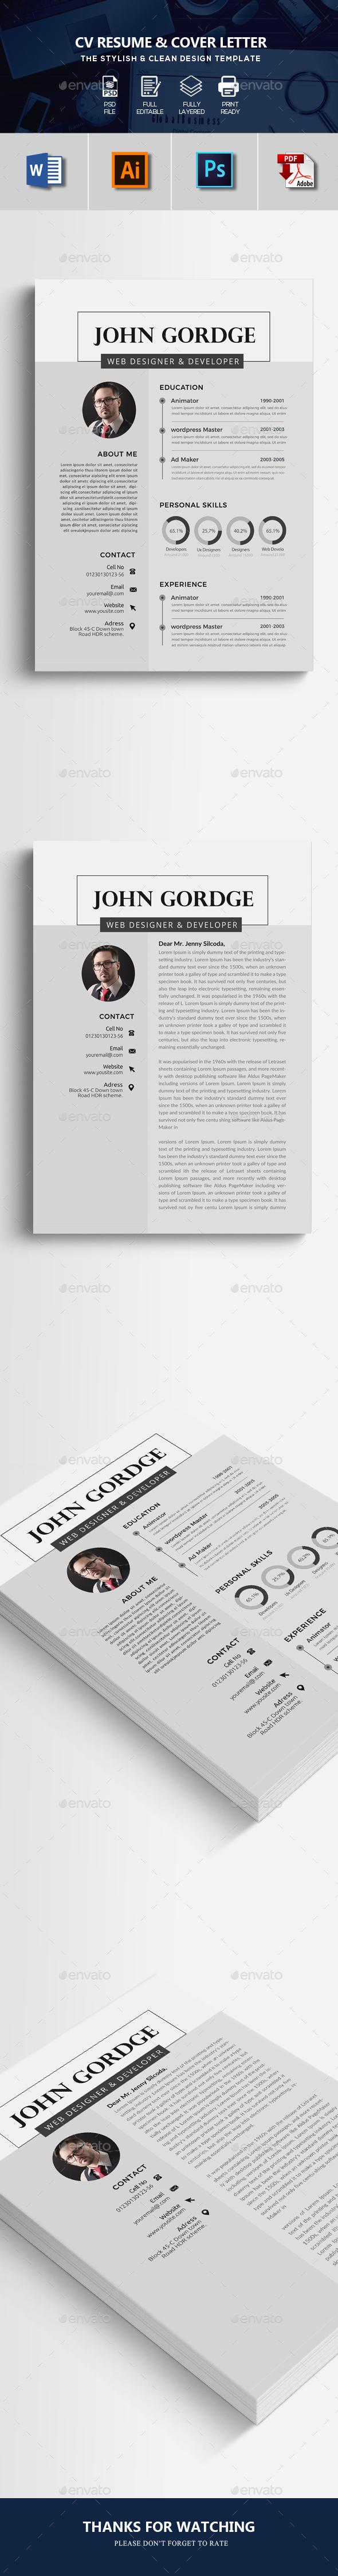 CV Resume Word Format - Resumes Stationery